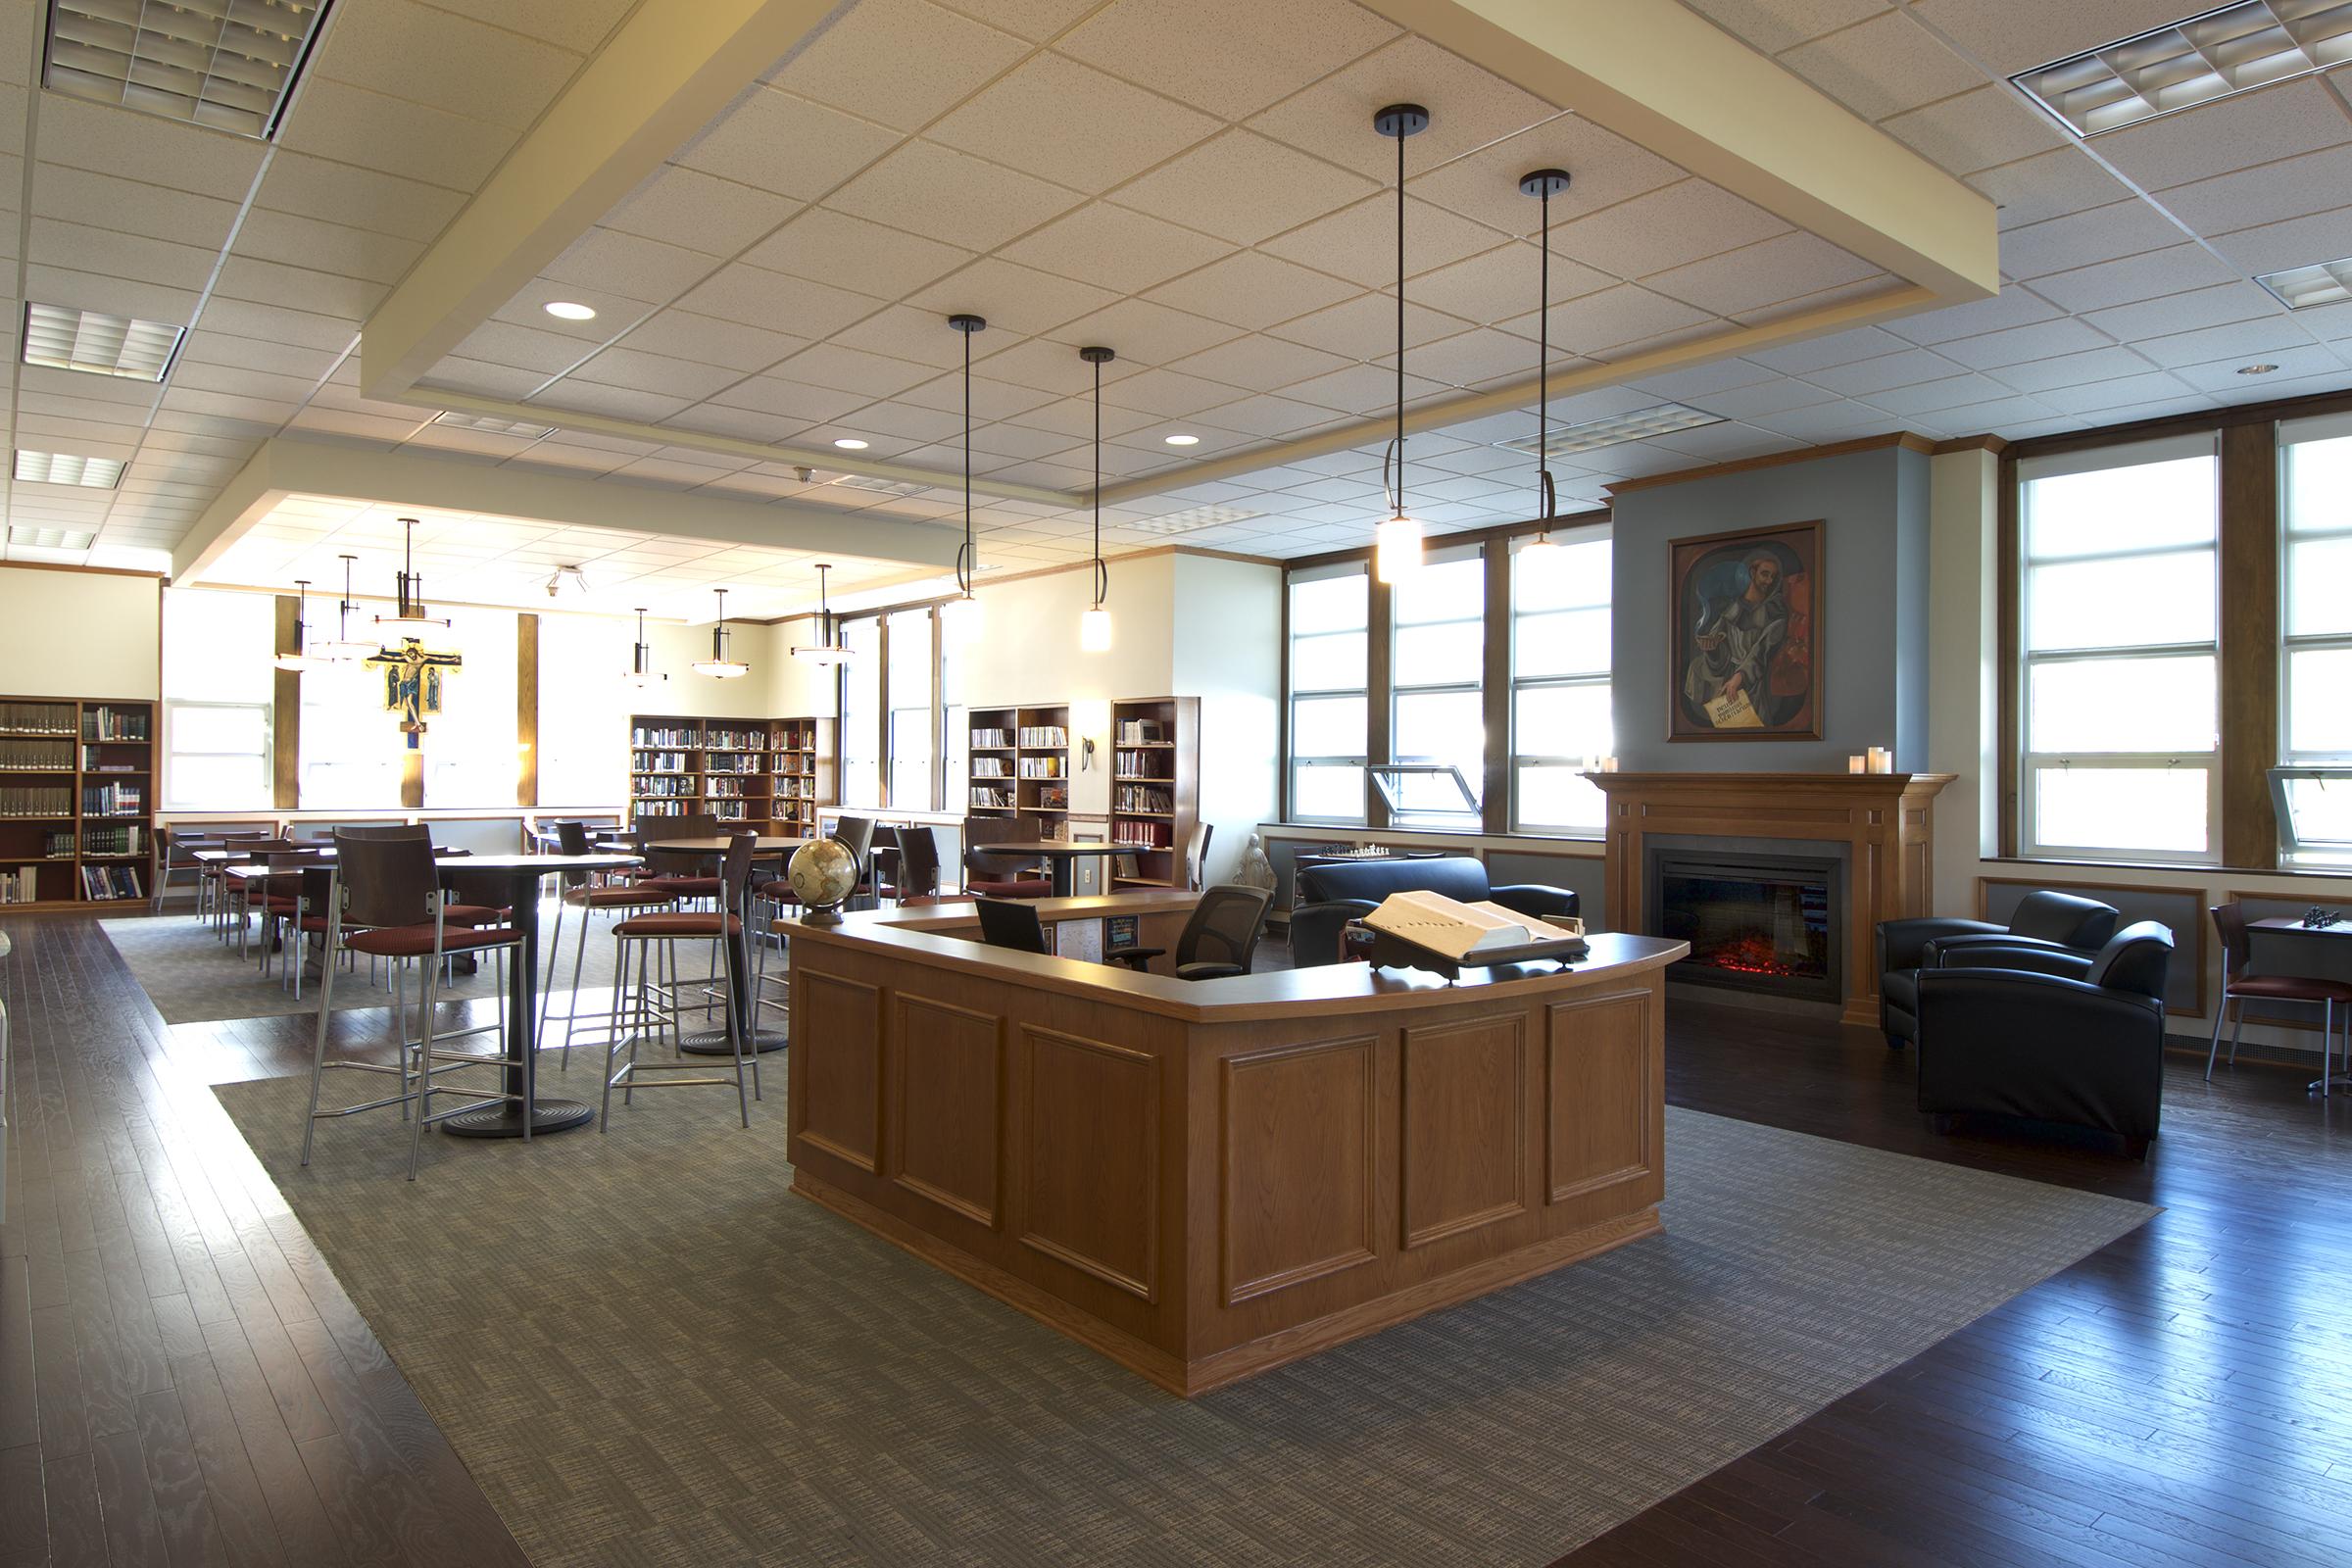 ST. FRANCIS HIGH SCHOOL LIBRARY - ATHOL SPRINGS, NEW YORK